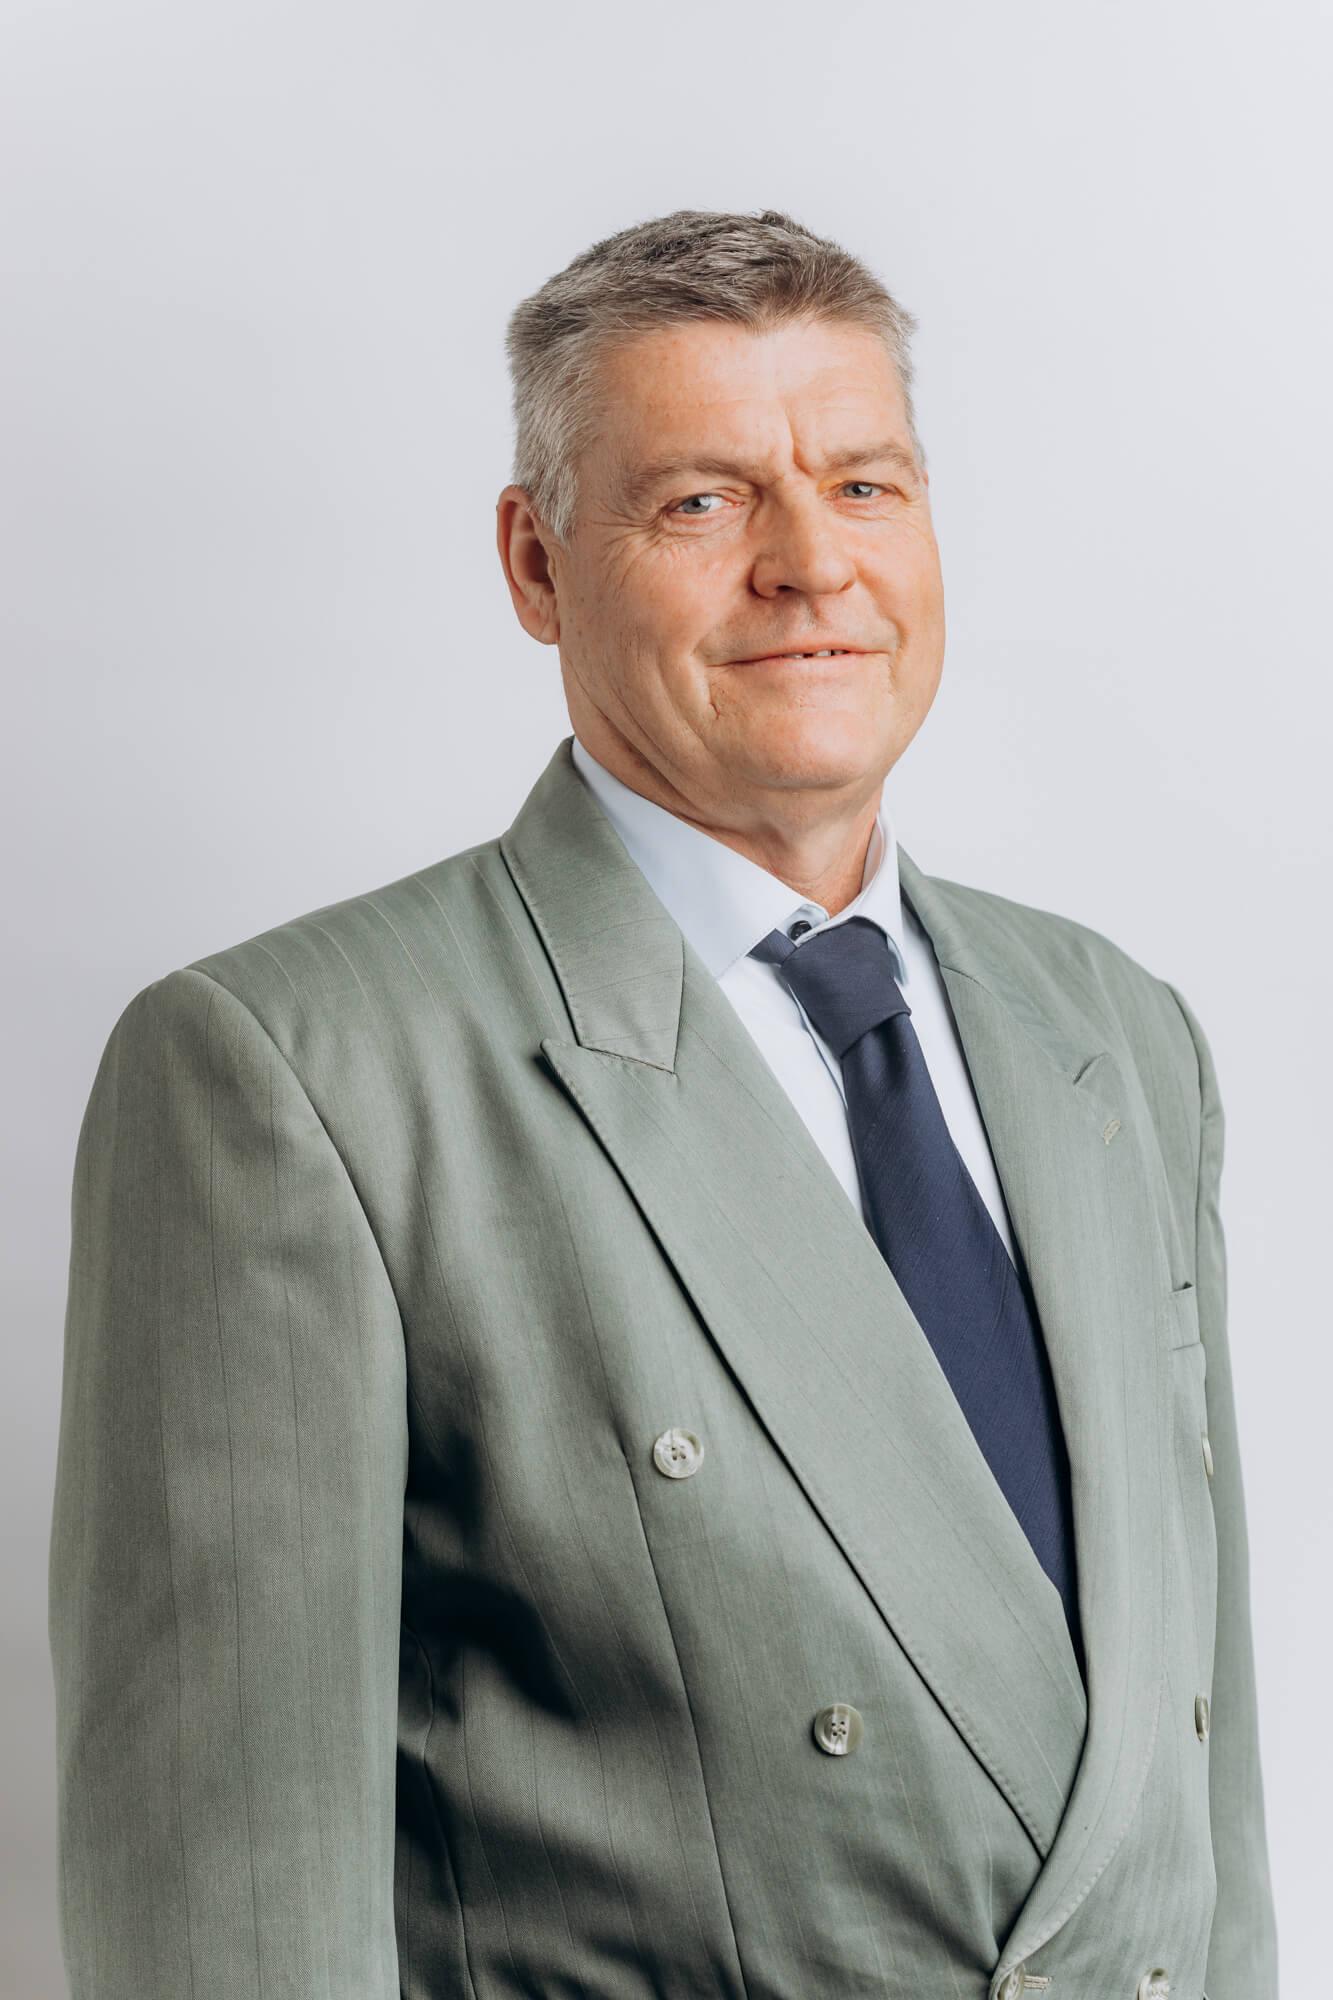 profila bilde